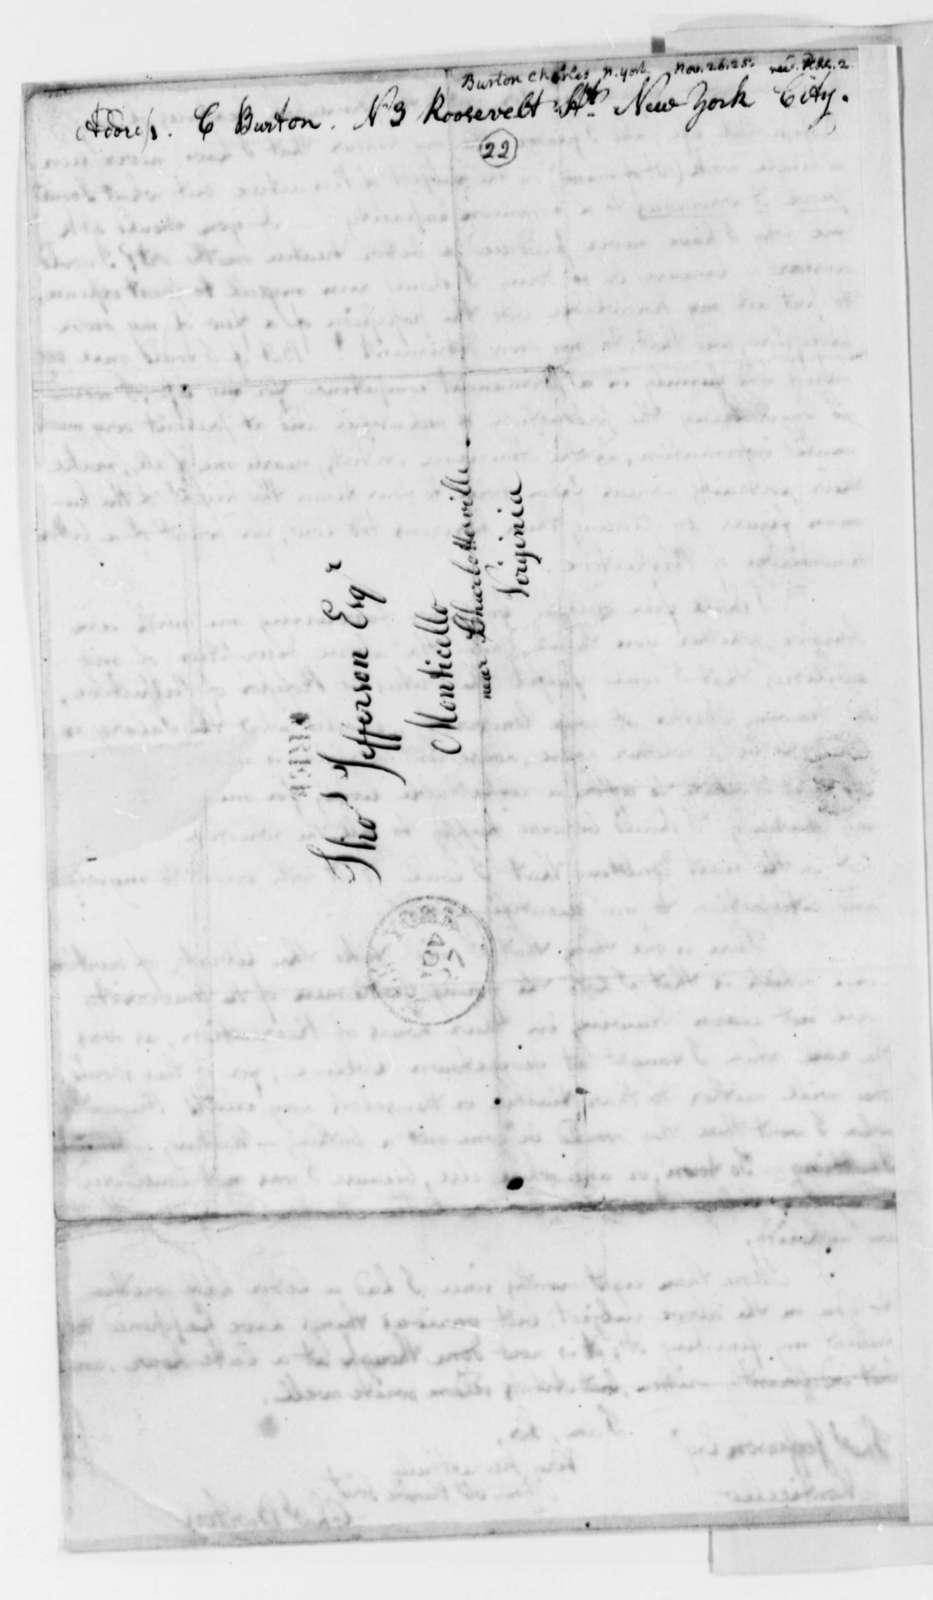 Charles Burton to Thomas Jefferson, November 26, 1825